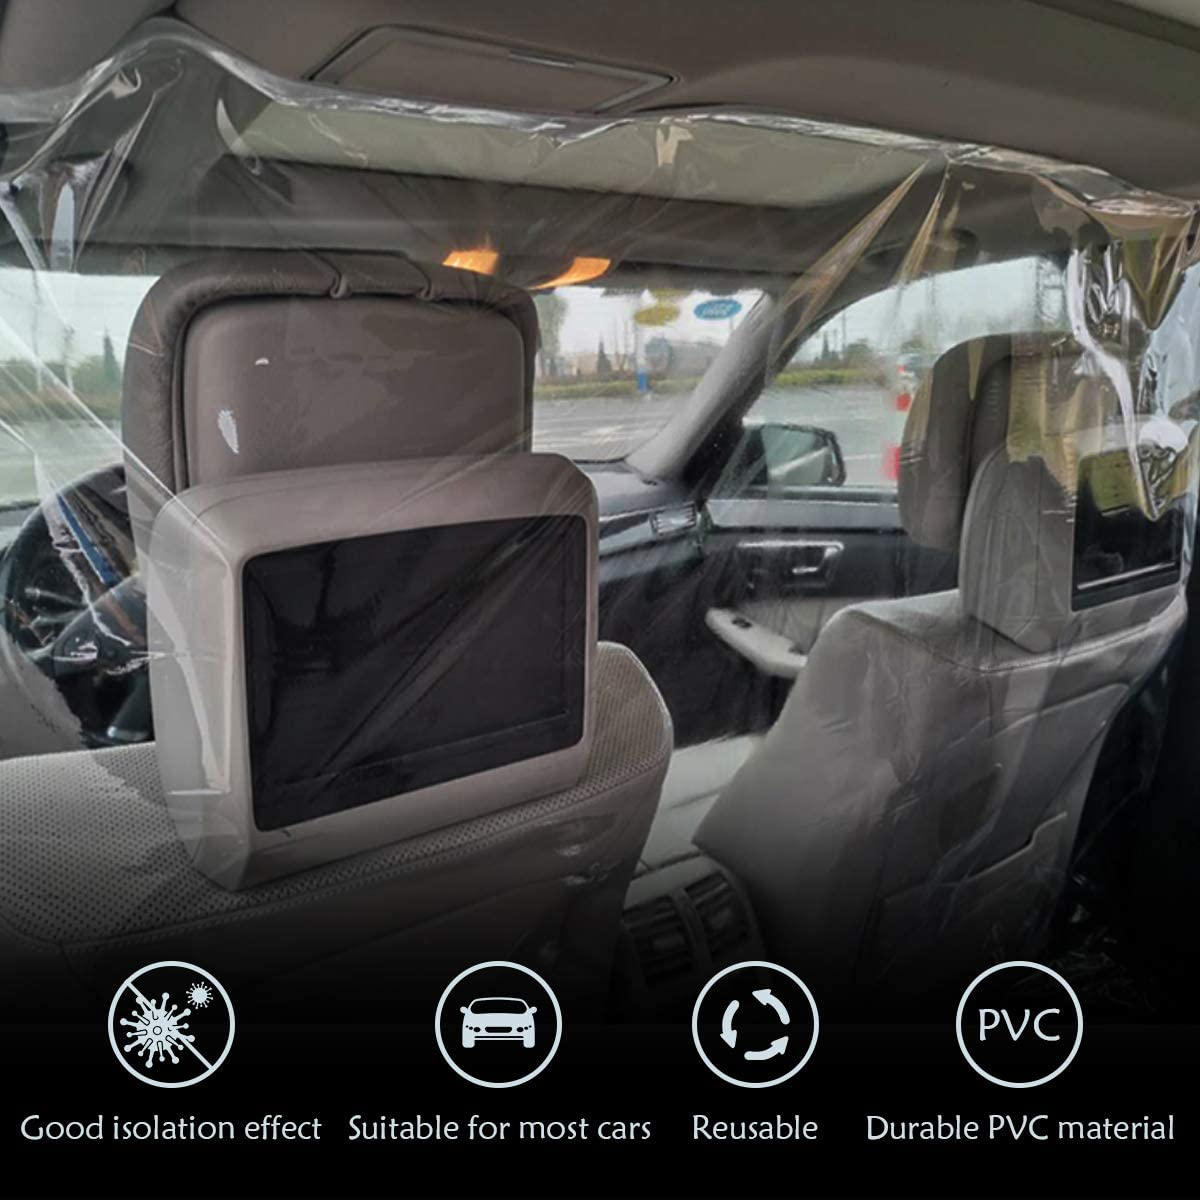 Car Isolation Film